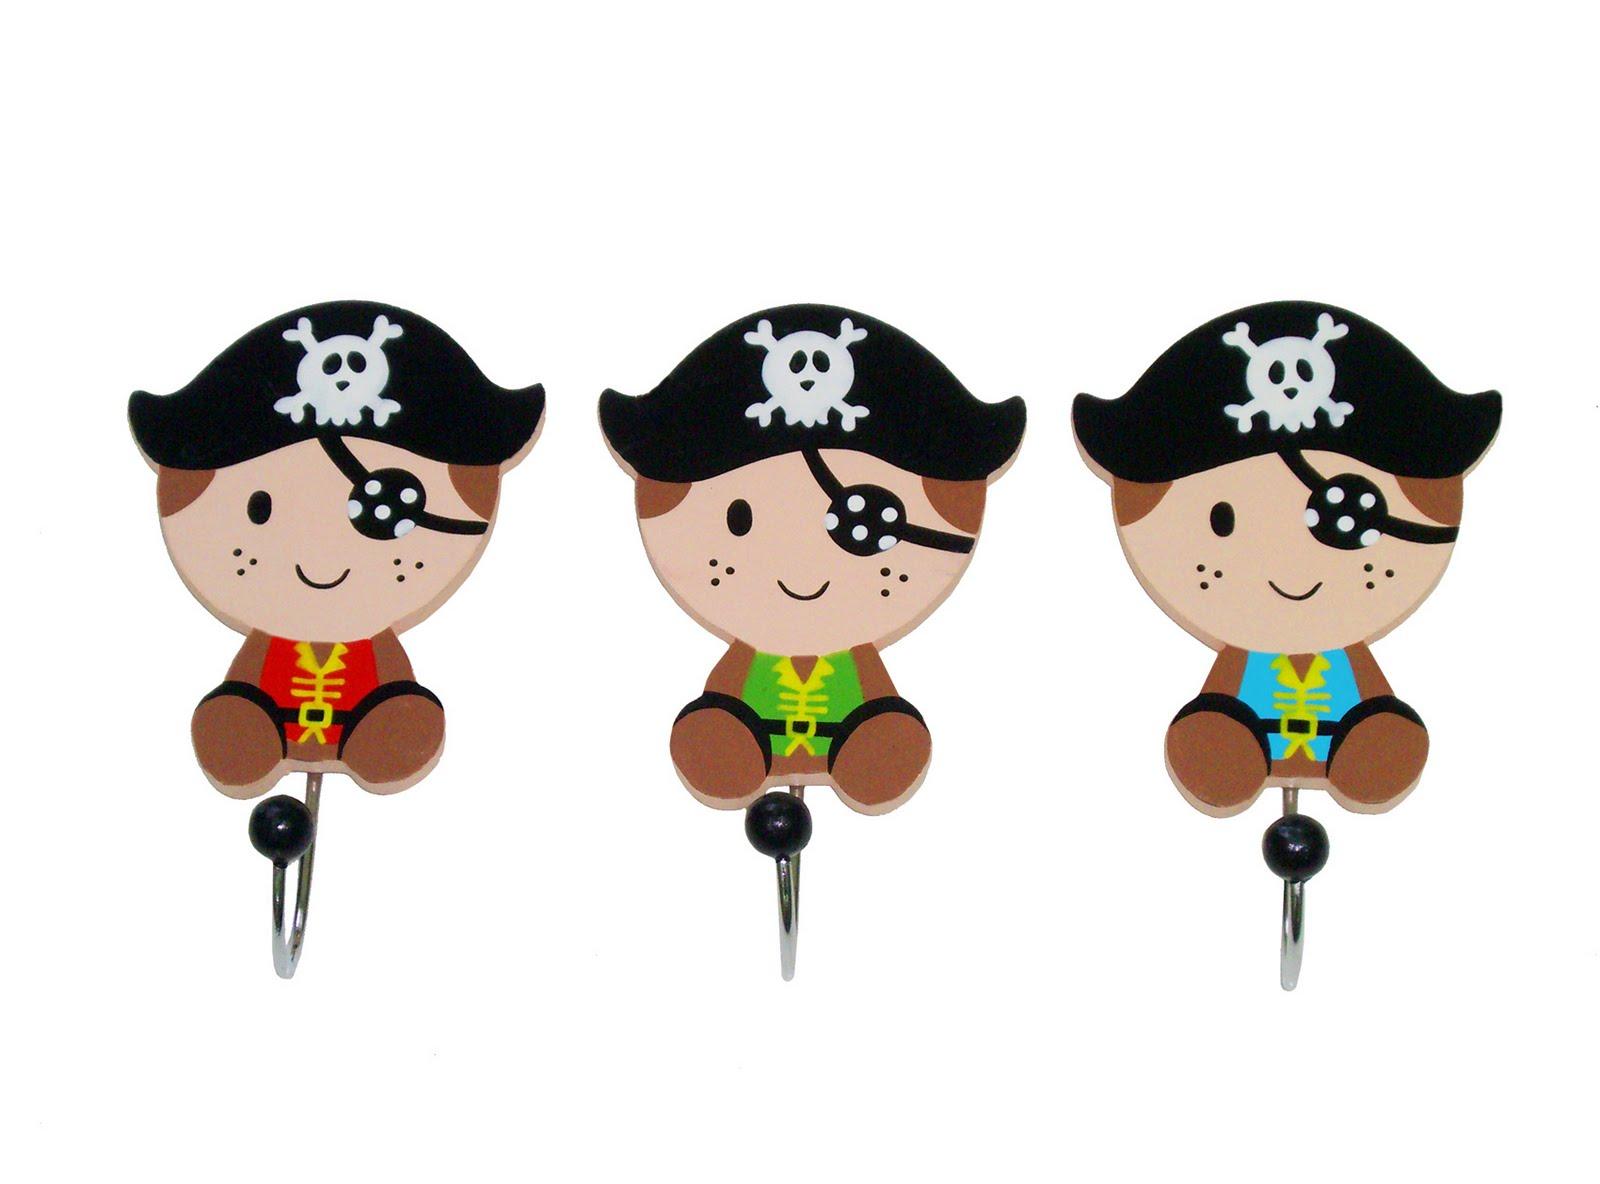 Sombreros de piratas para ni os imagui - Piratas infantiles imagenes ...